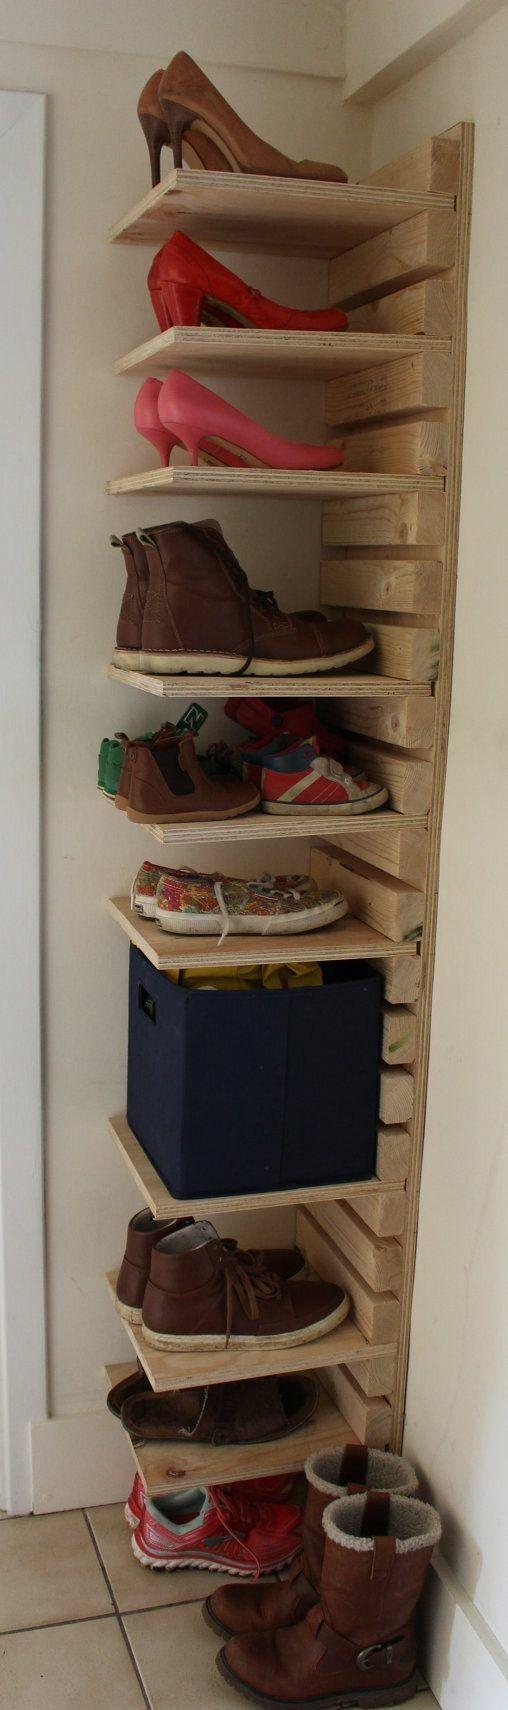 best craft build images on pinterest furniture ideas night